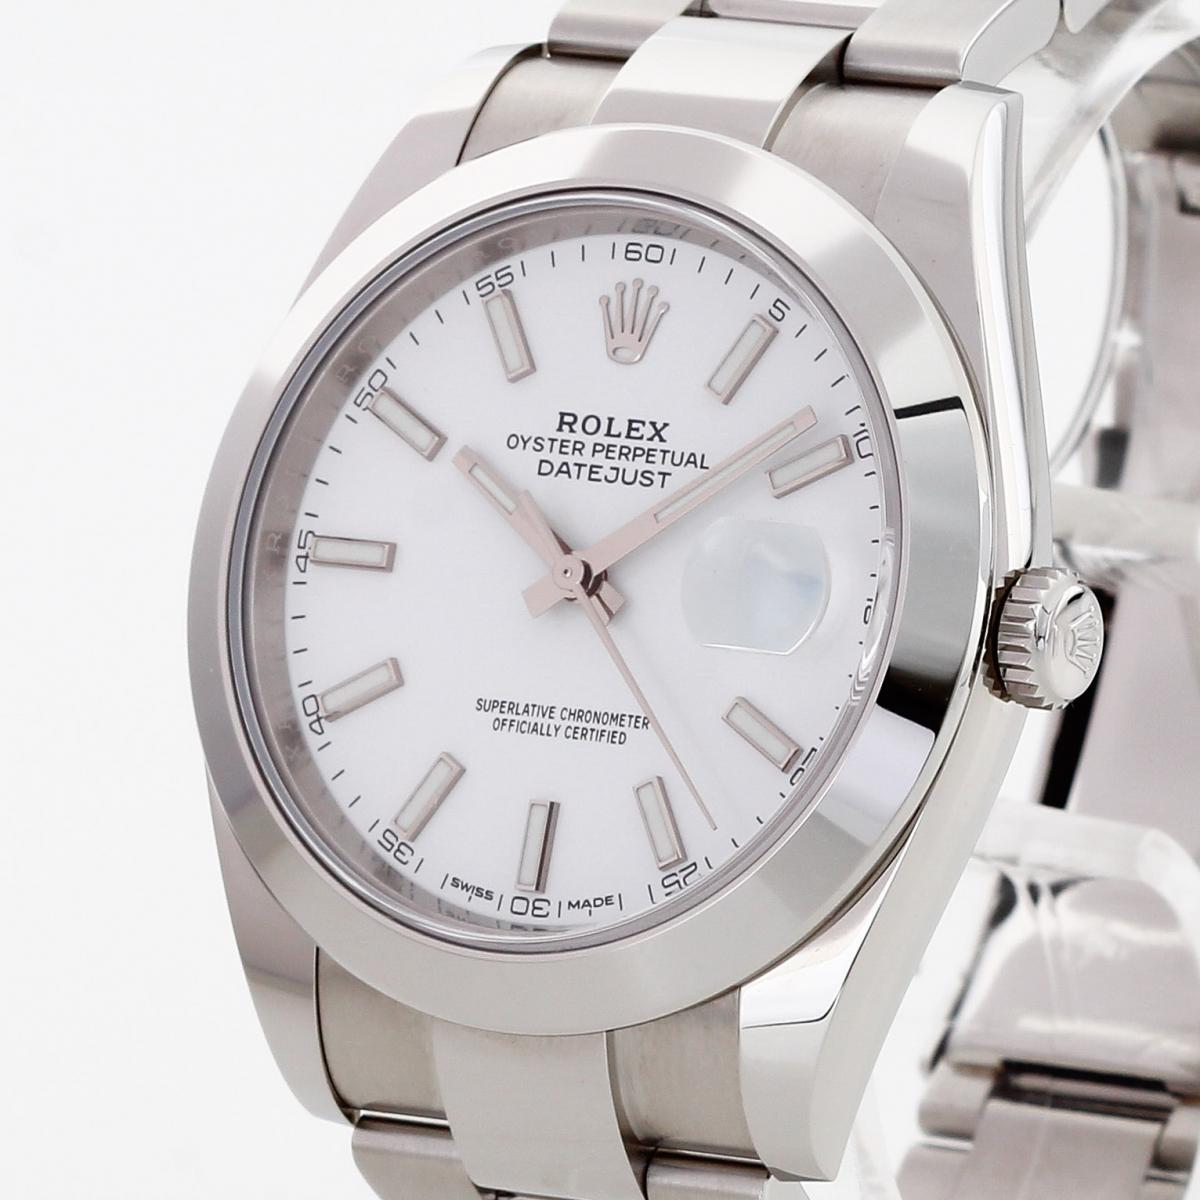 Rolex Oyster Perpetual Datejust II Edelstahl Ref. 126300 LC100 Fullset 2018